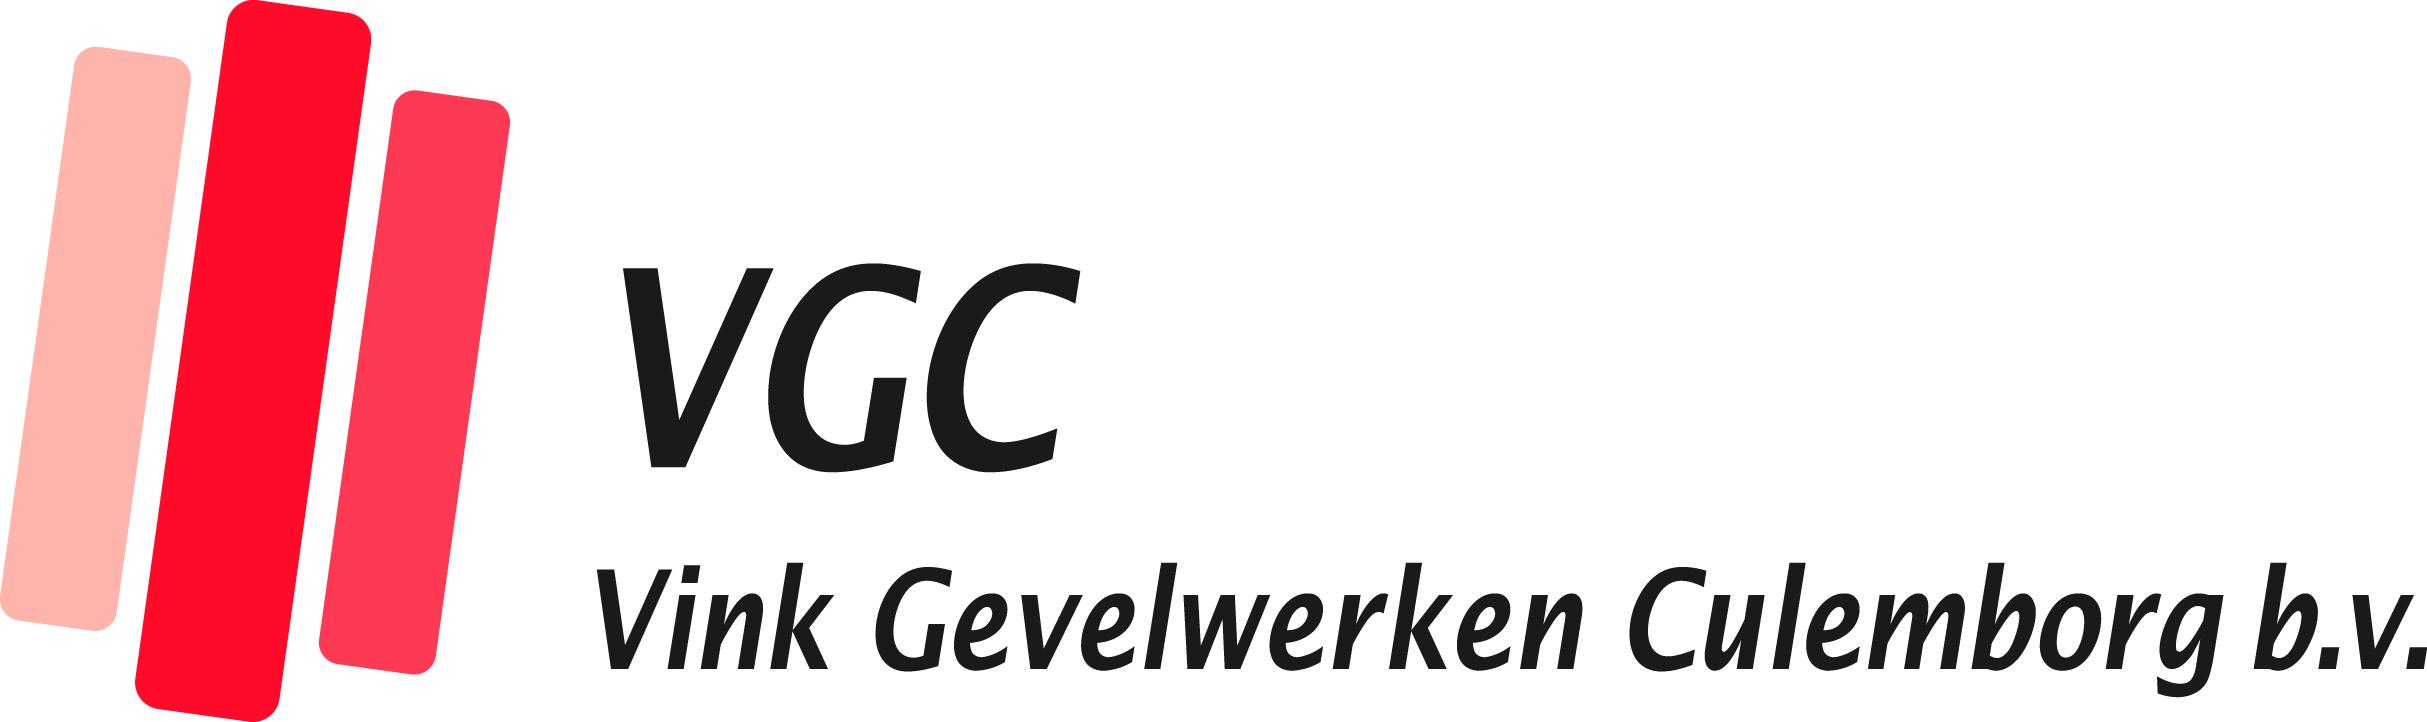 VGC-logo-NEW - kopie